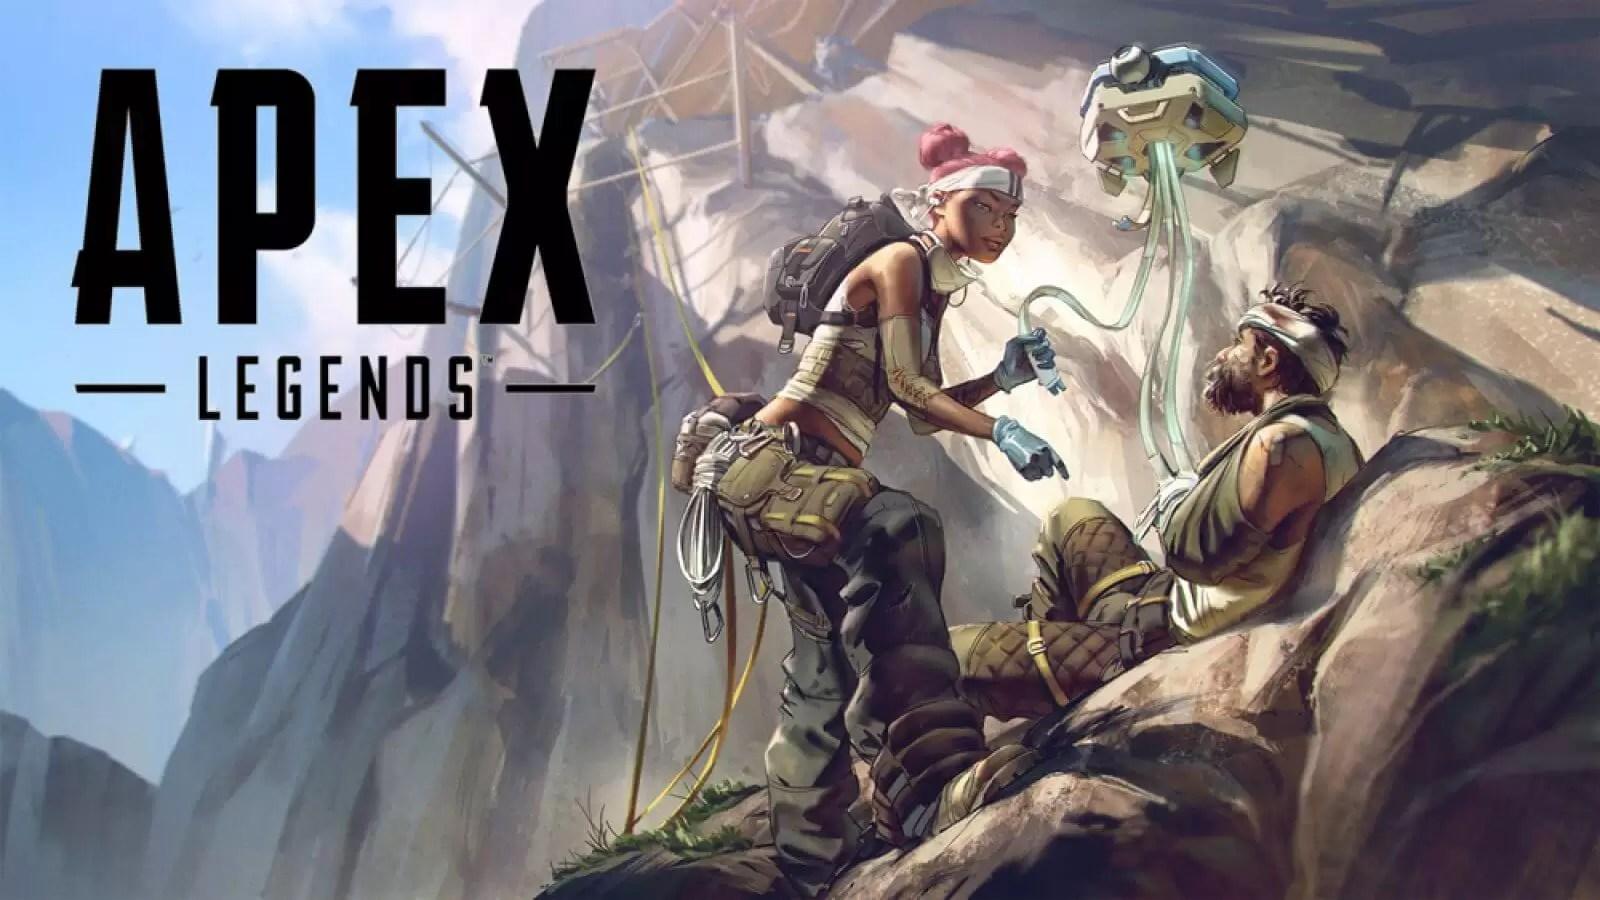 Twitch Rivals turnir u igri Apex Legends u ring stavlja gomilu poznatih strimera